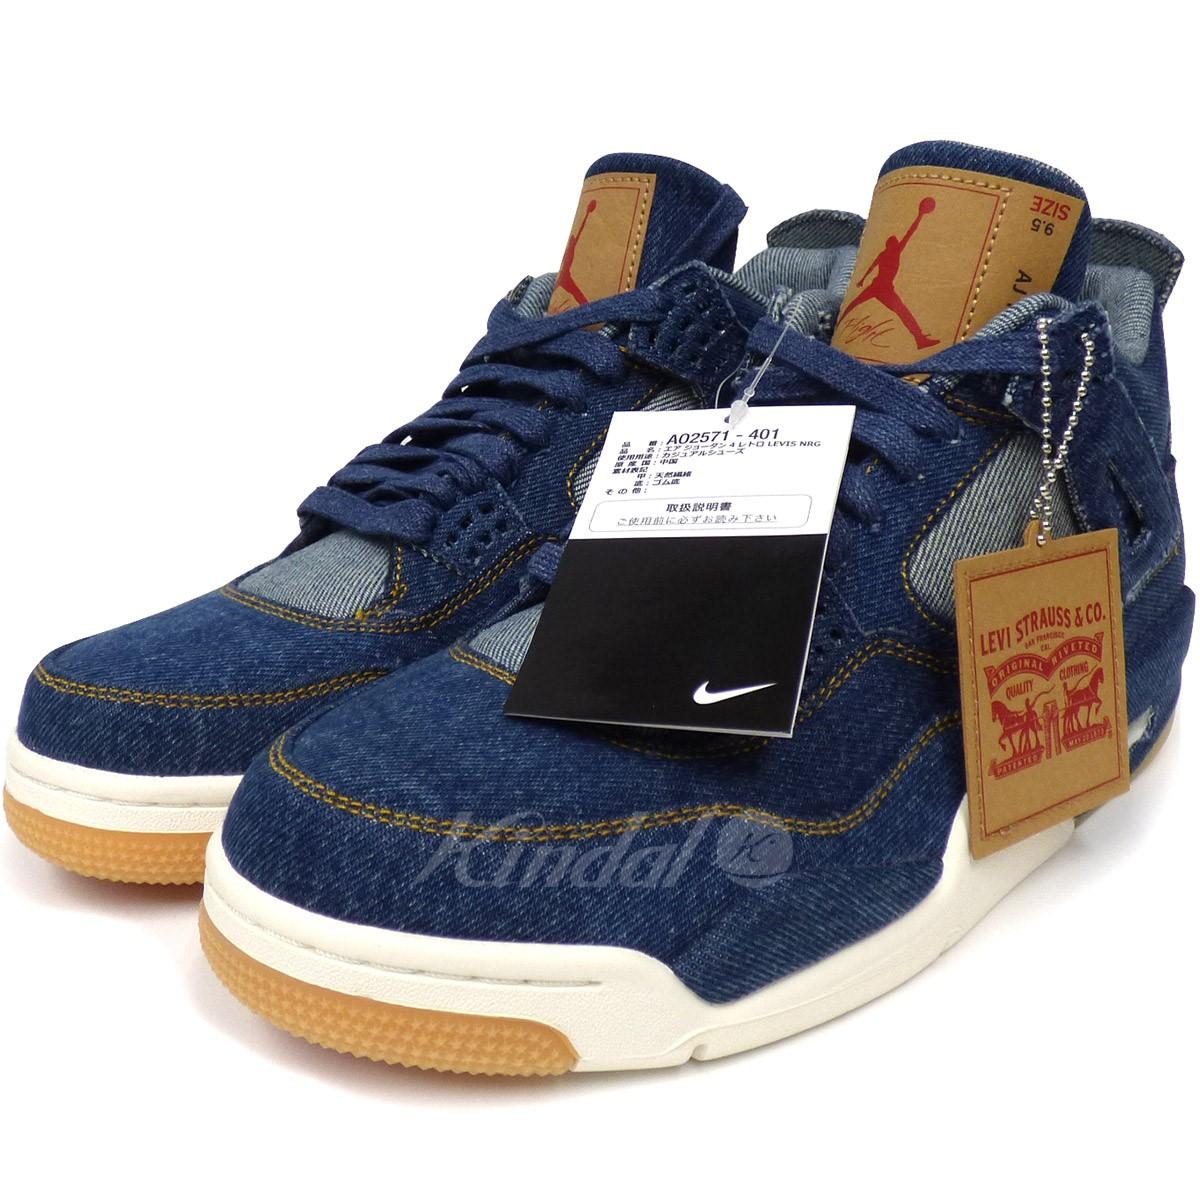 a4afe40c7b266 NIKE X LEVI  S AIR JORDAN 4 RETRO LEVIS NRG Air Jordan 4 sneakers indigo  size  US9. 5 (27.5cm) (Nike Levis)